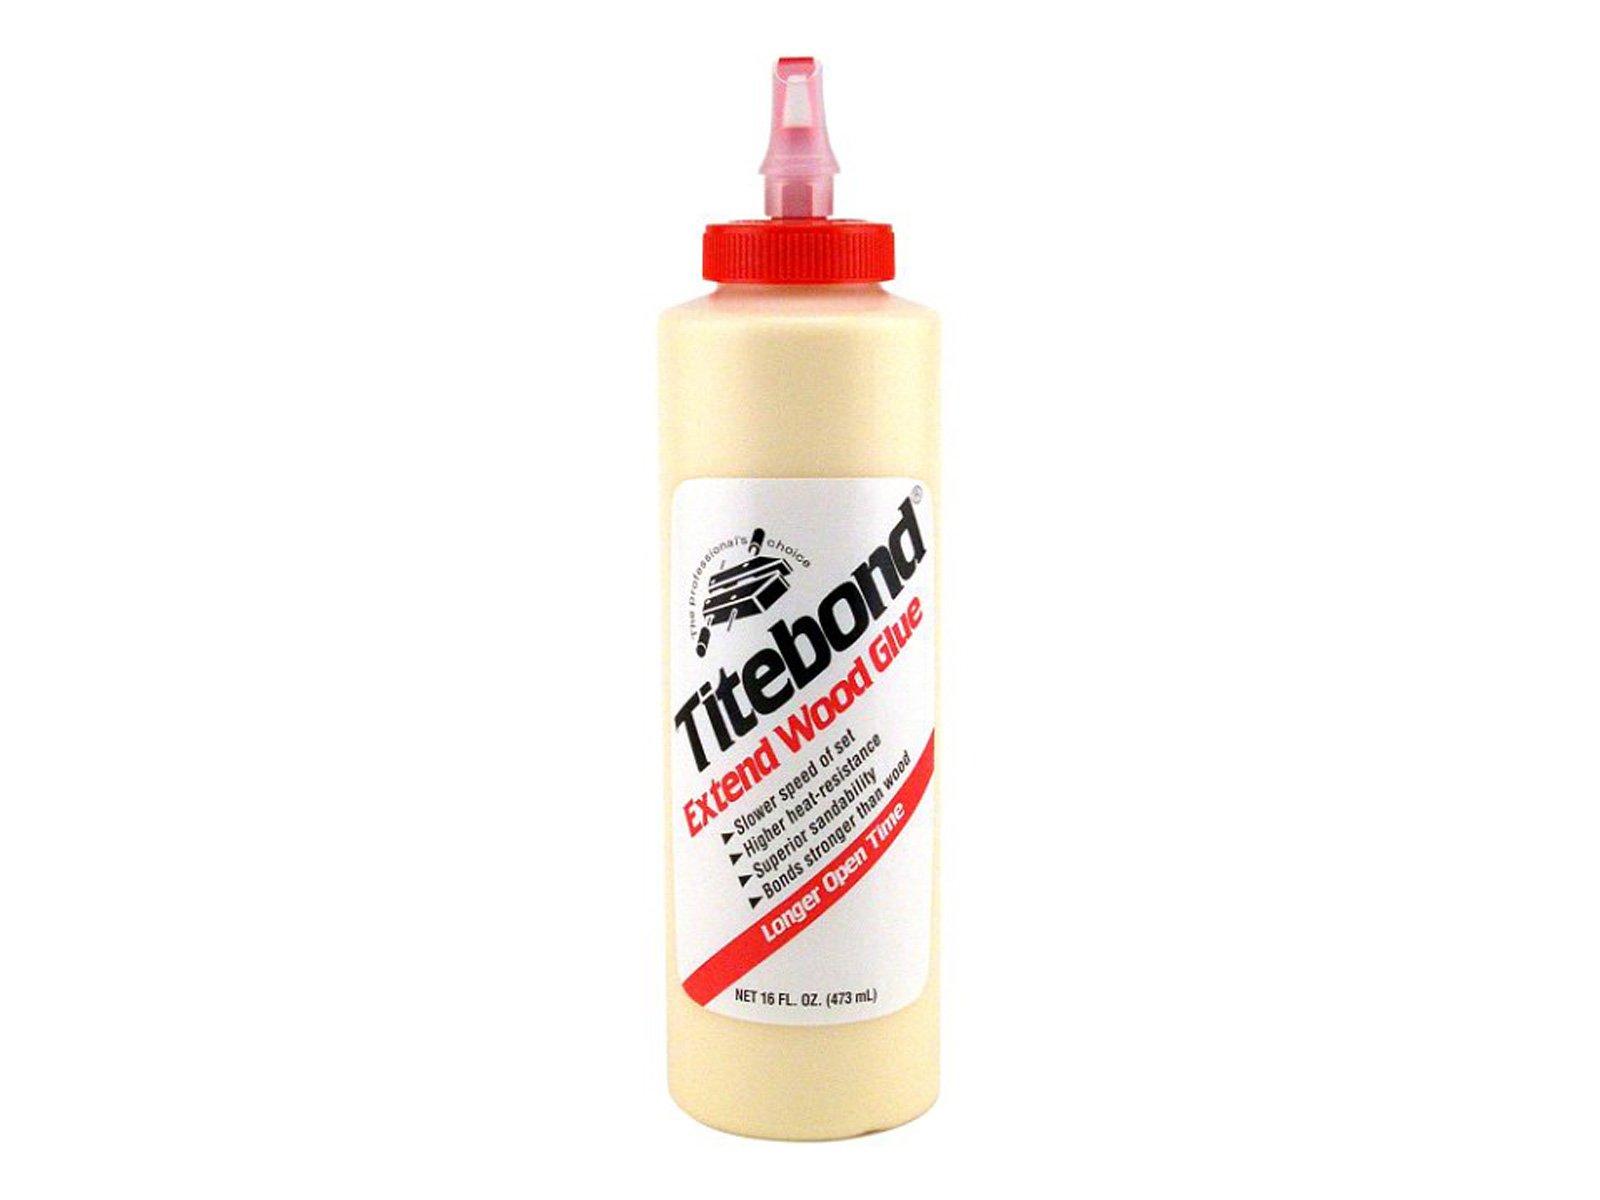 Titebond Extend Wood Glue, 16 Ounce